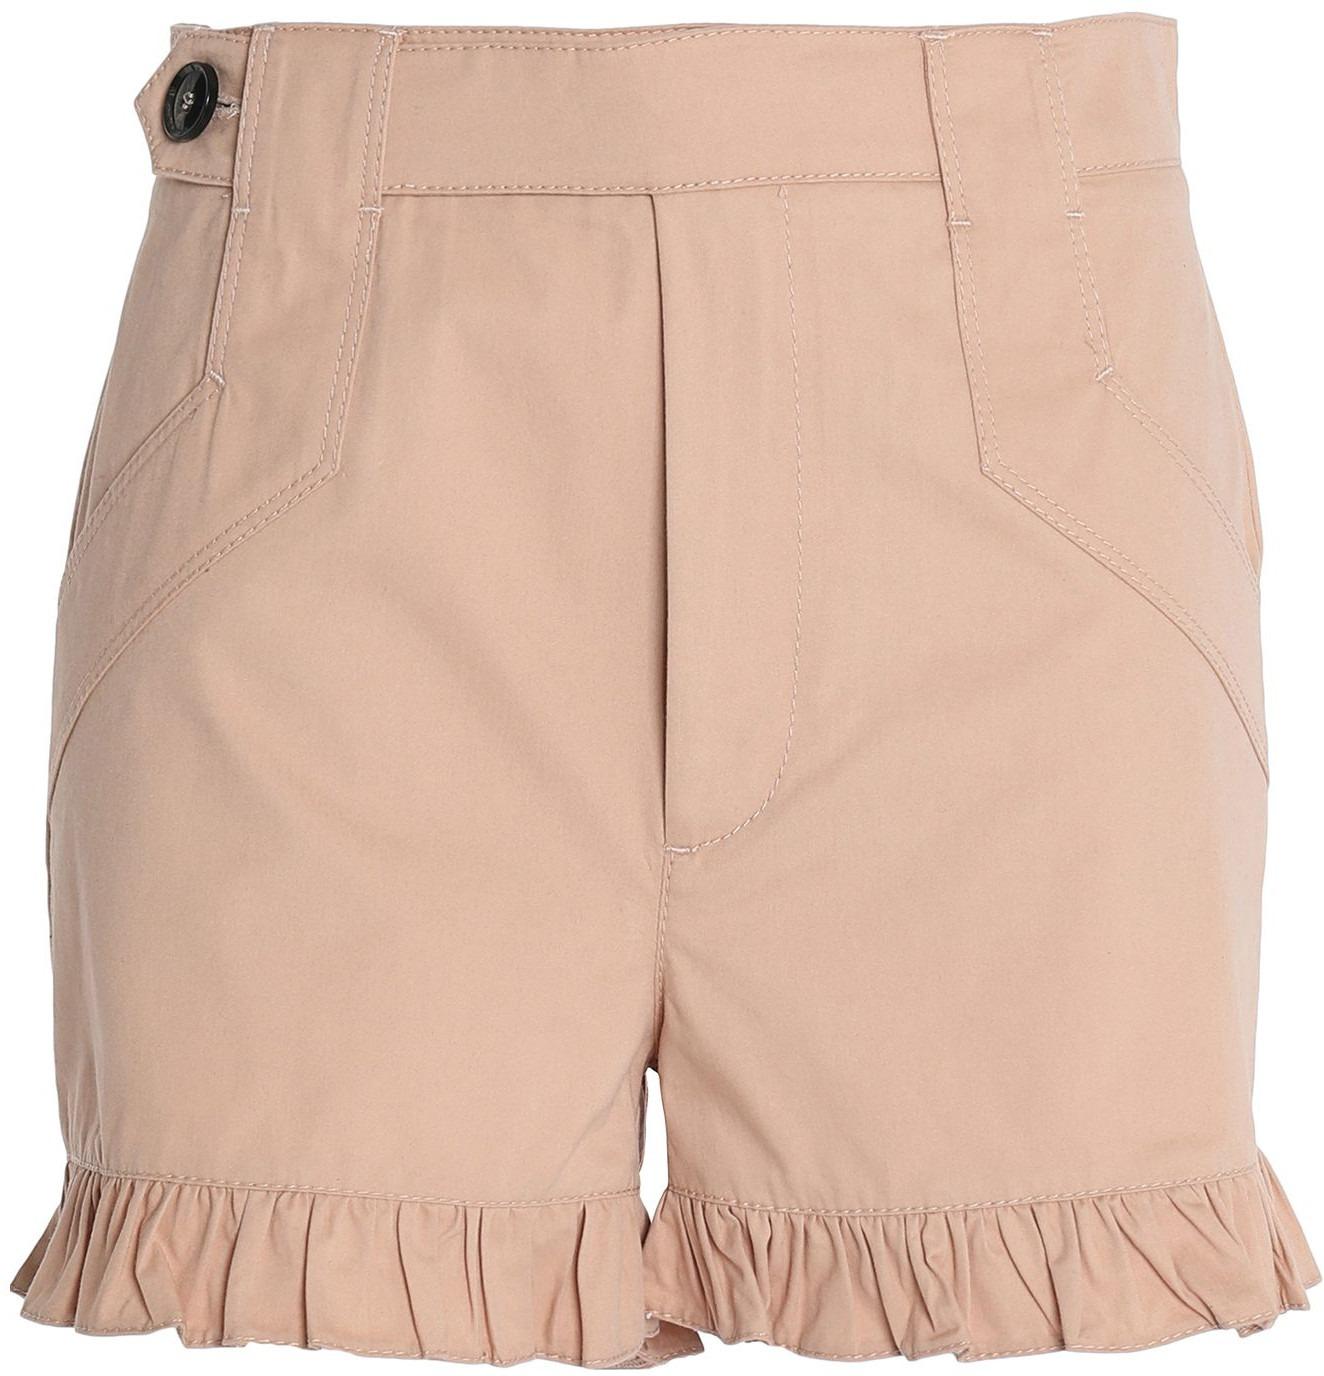 Pantaloni corti e shorts tinta unita beige | Tendenze Donna